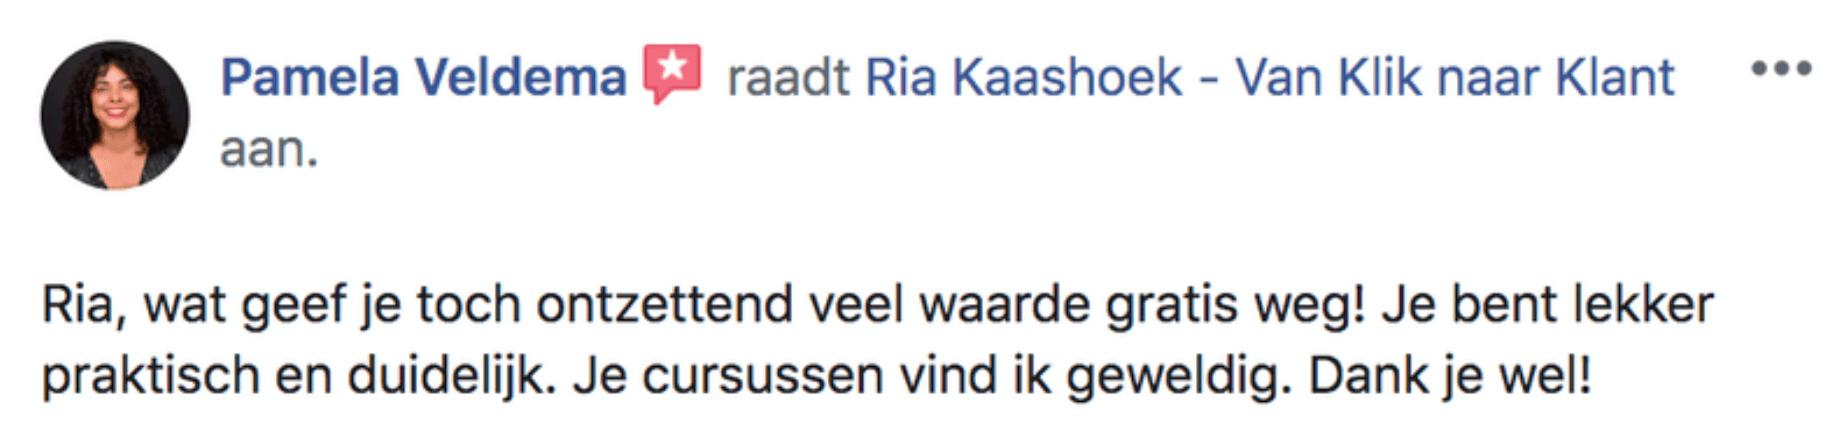 Pamela Veldema - ervaring Van Klik naar Klant